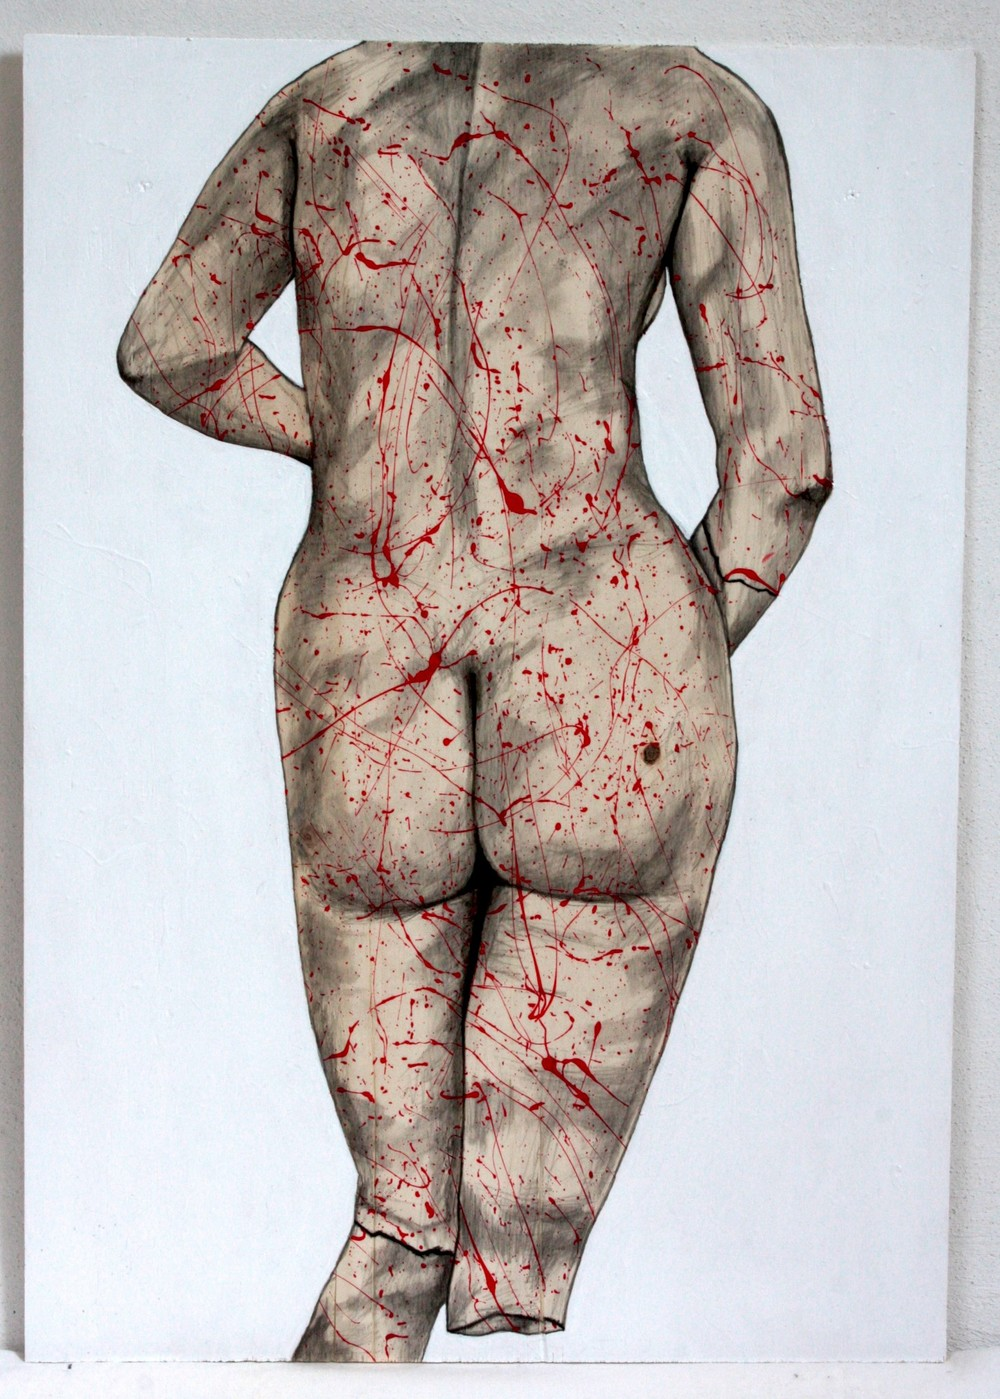 Pollock'd, Missing Leg